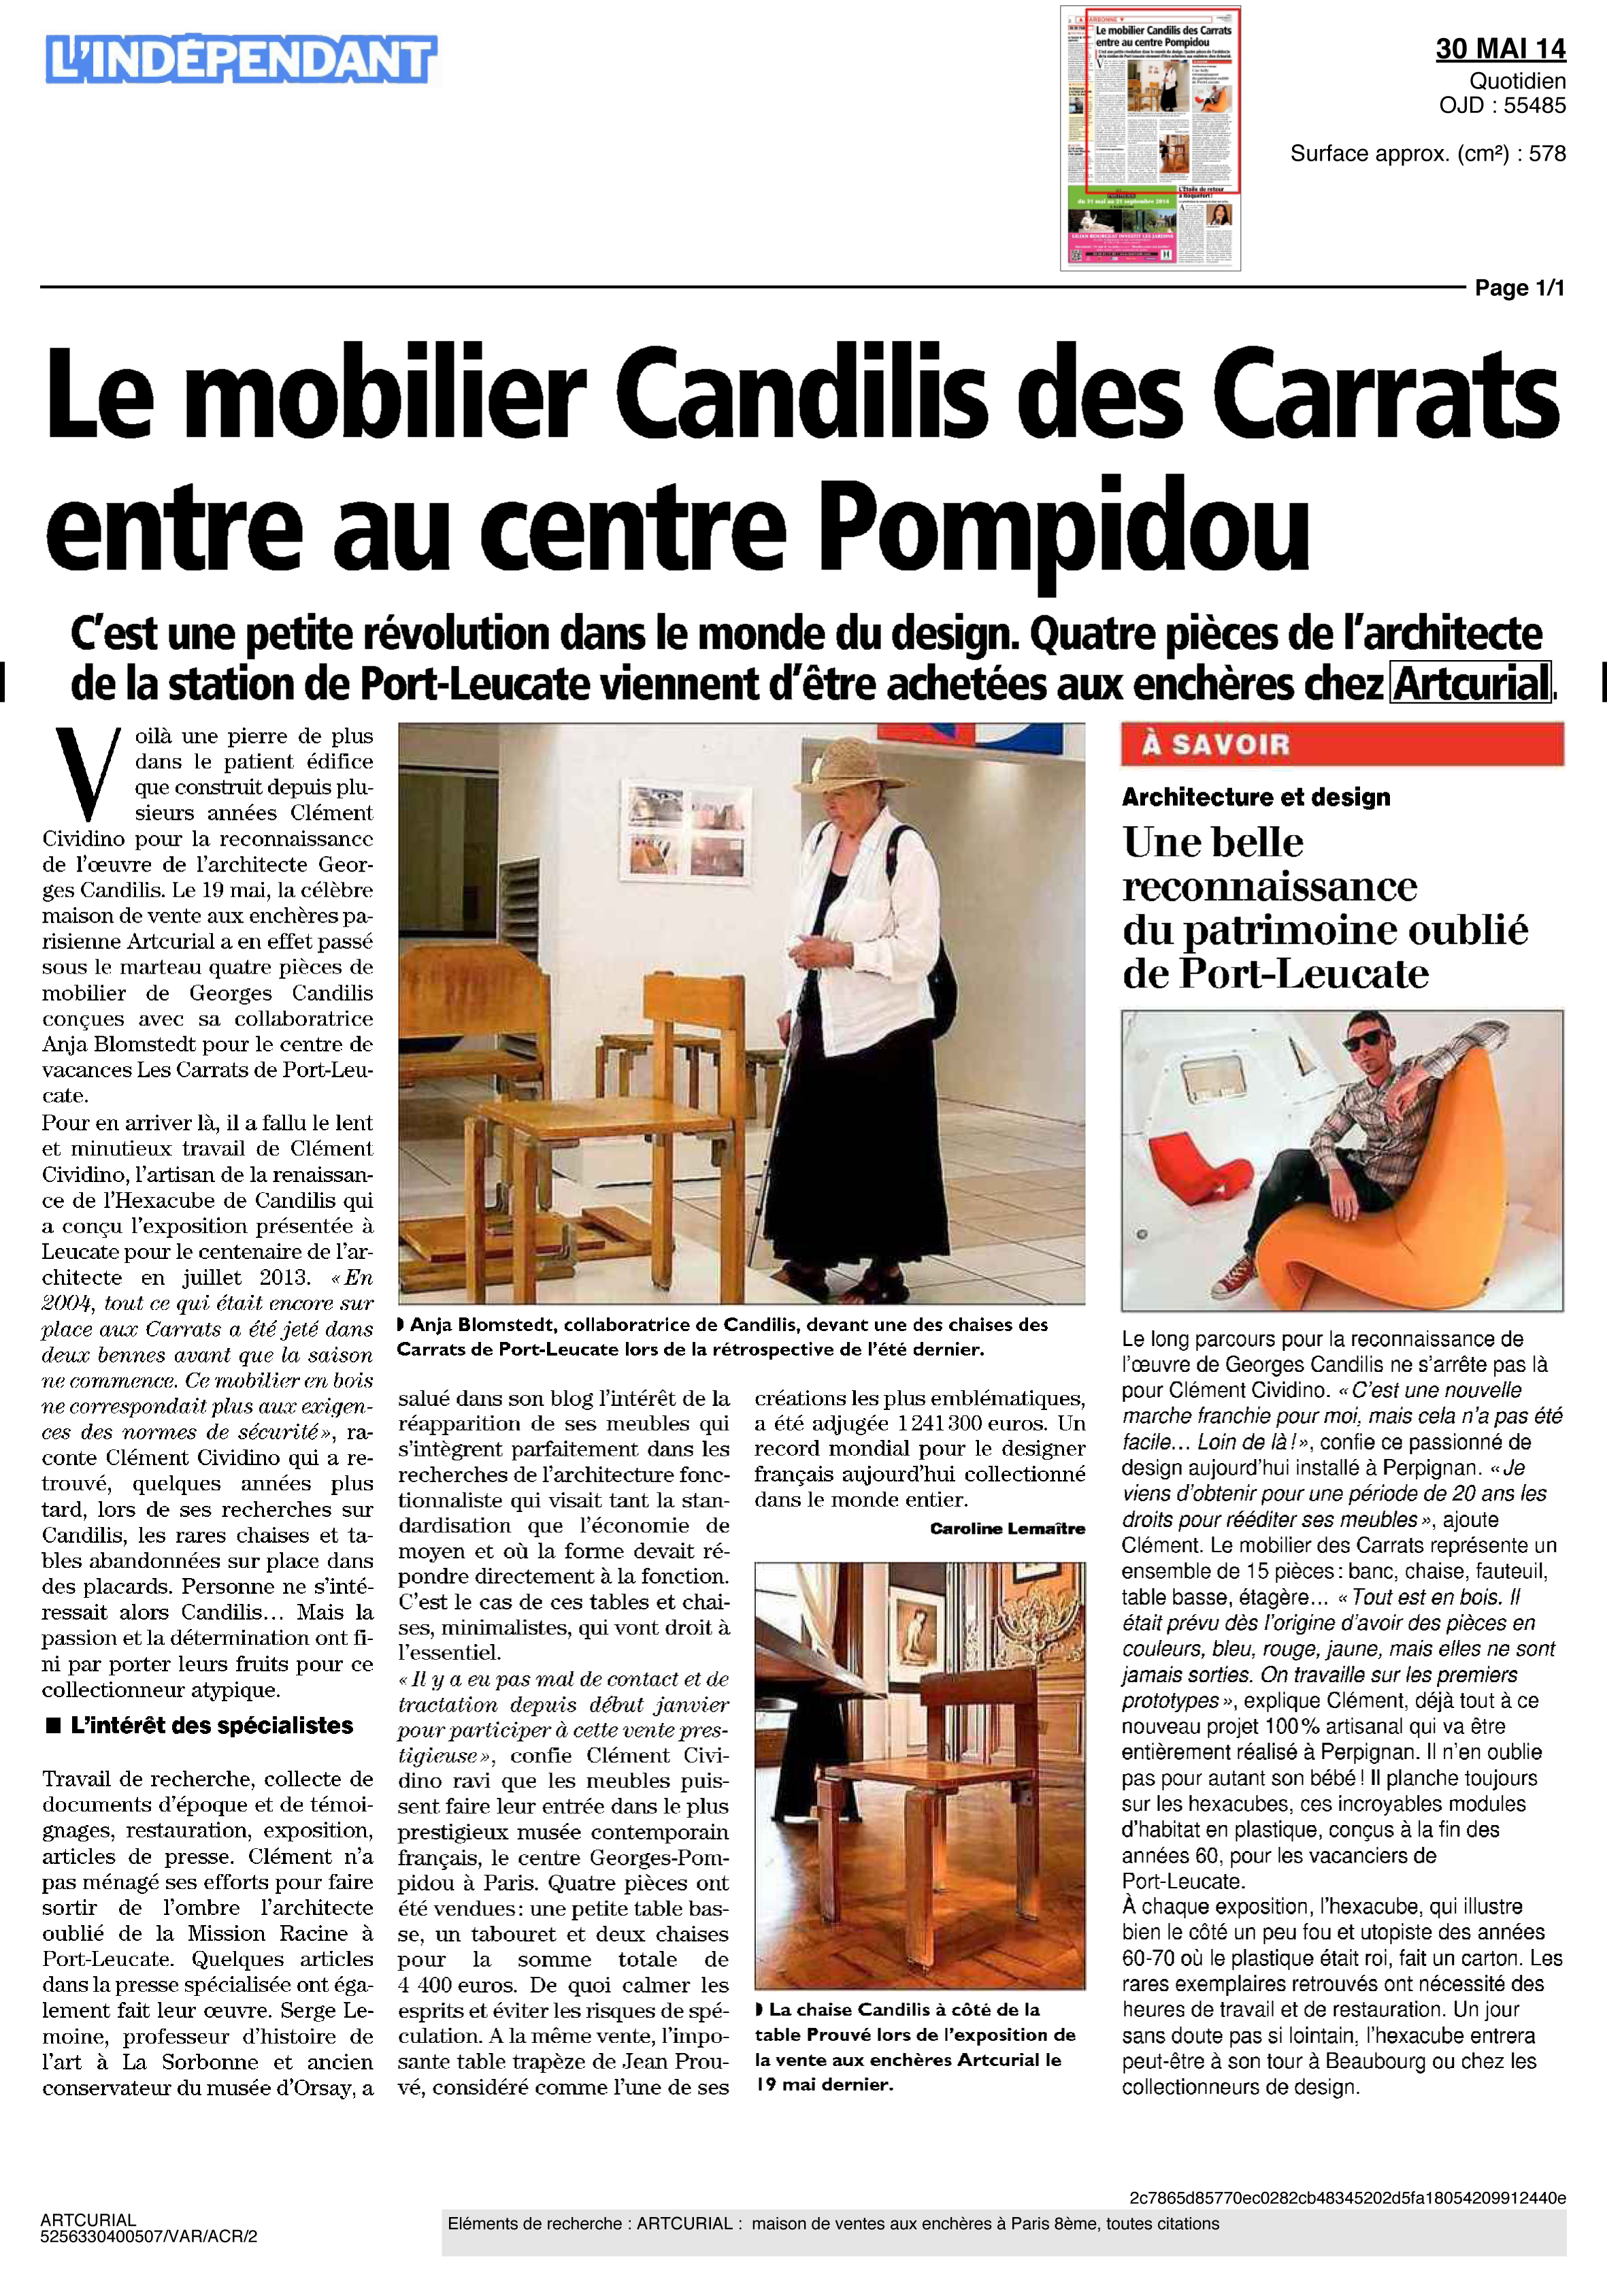 L'Independant-Candilis-Mai2014